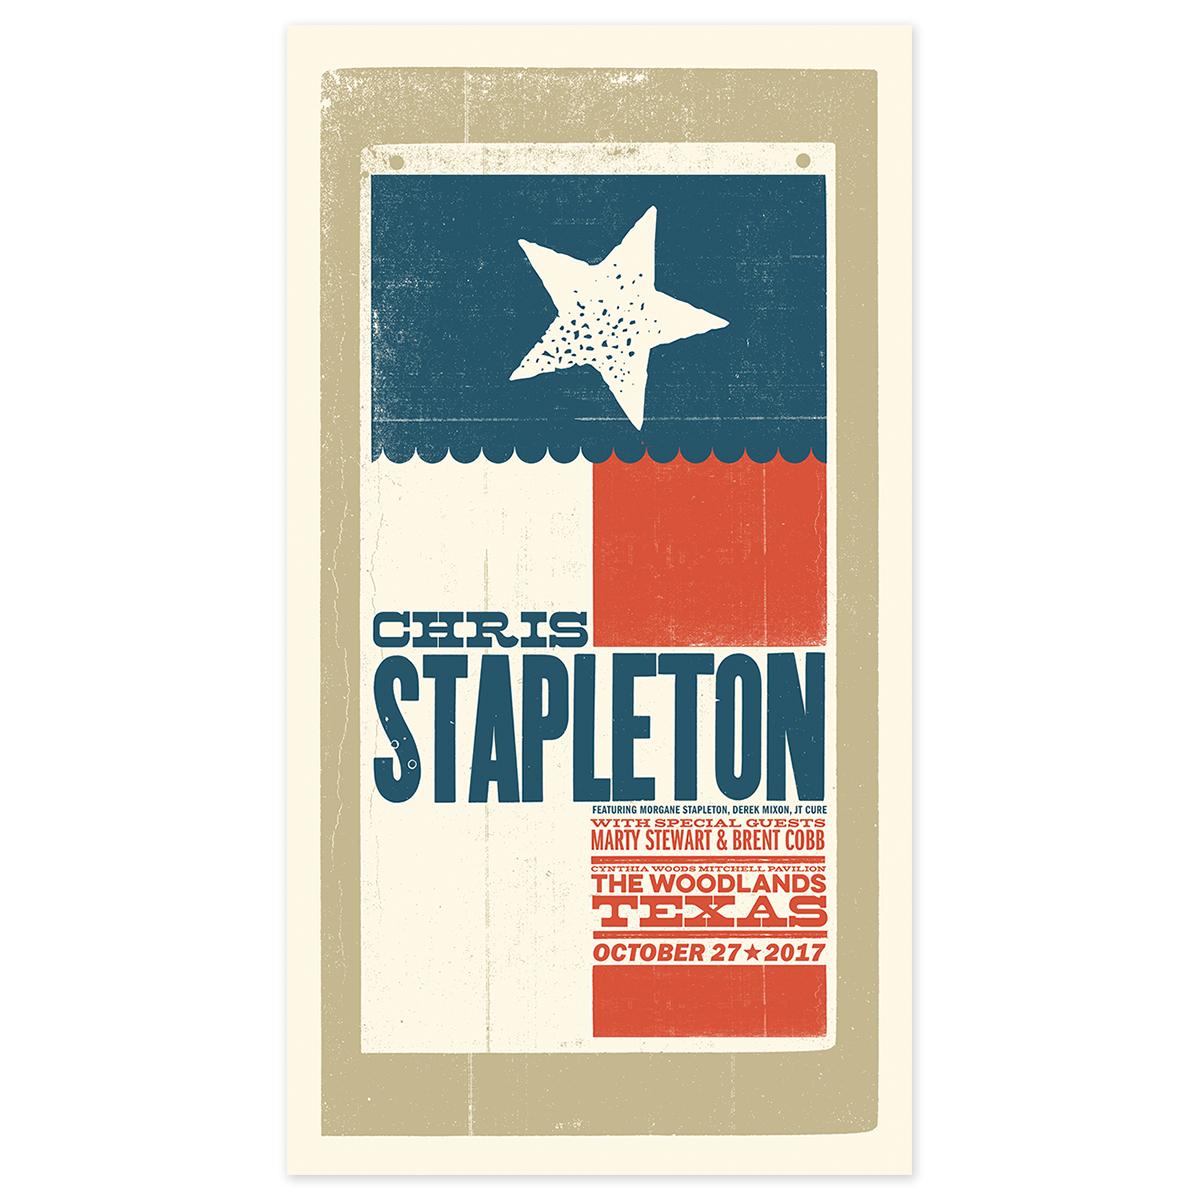 Chris Stapleton Show Poster – The Woodlands, TX 10/27/17